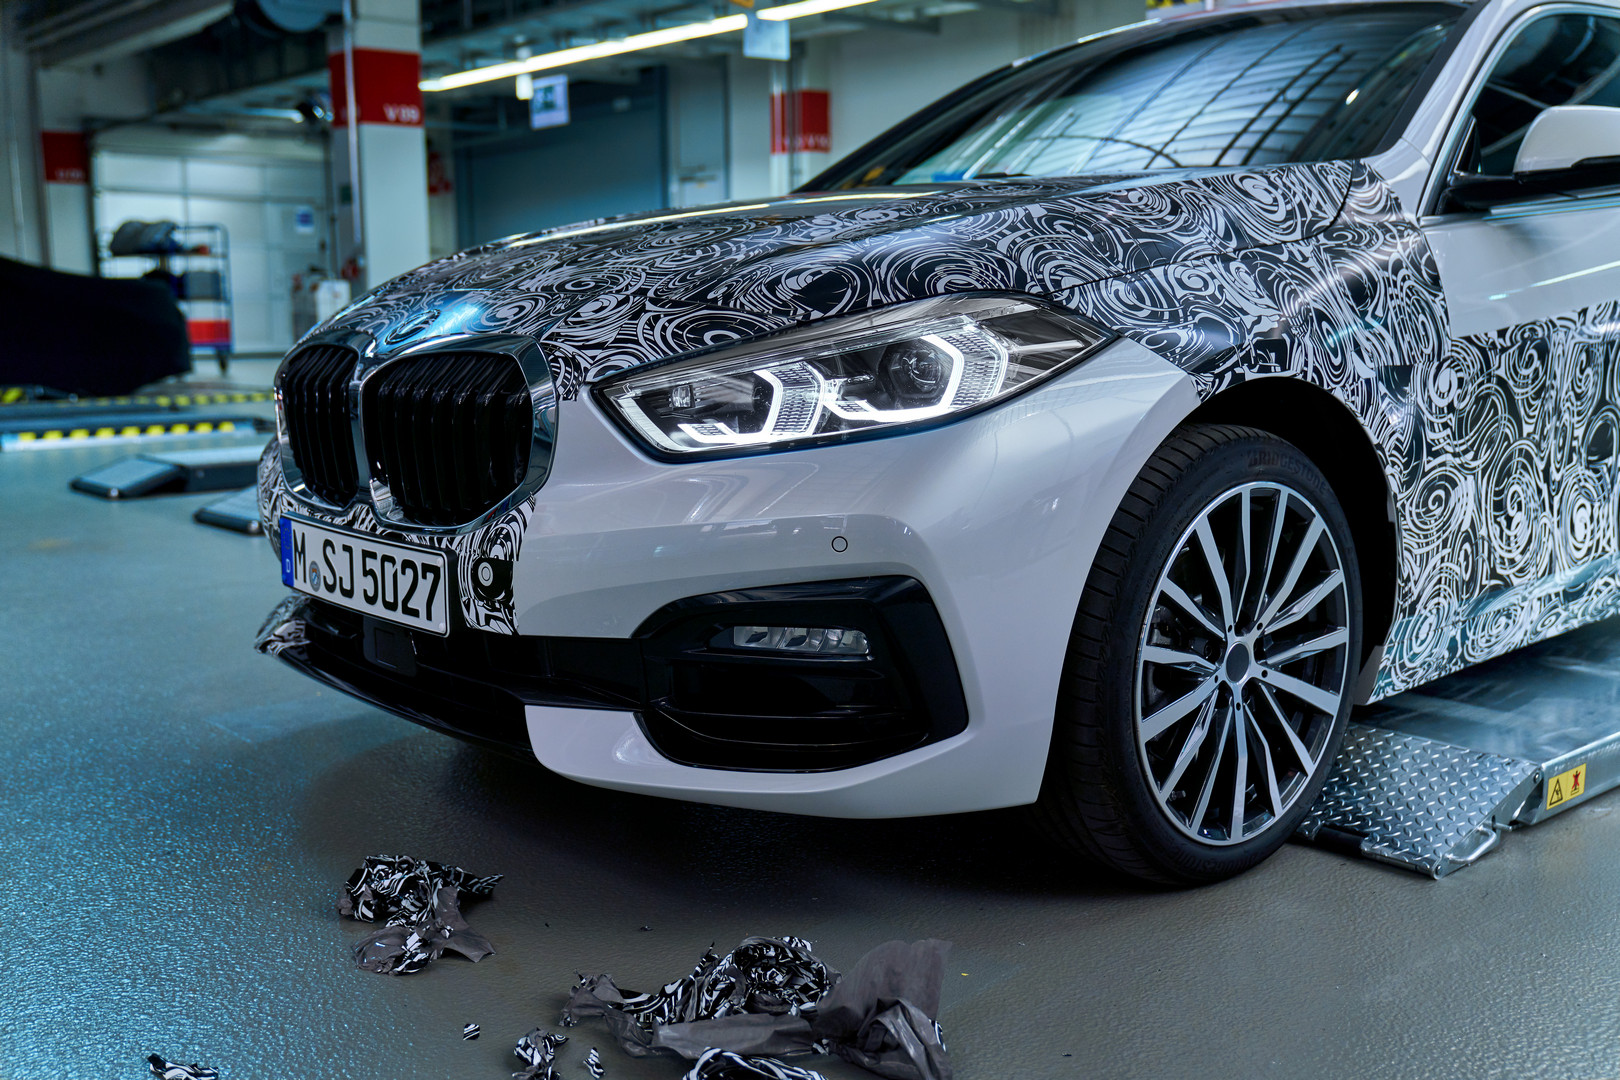 2020 BMW 1-series: We Take Off The Camo